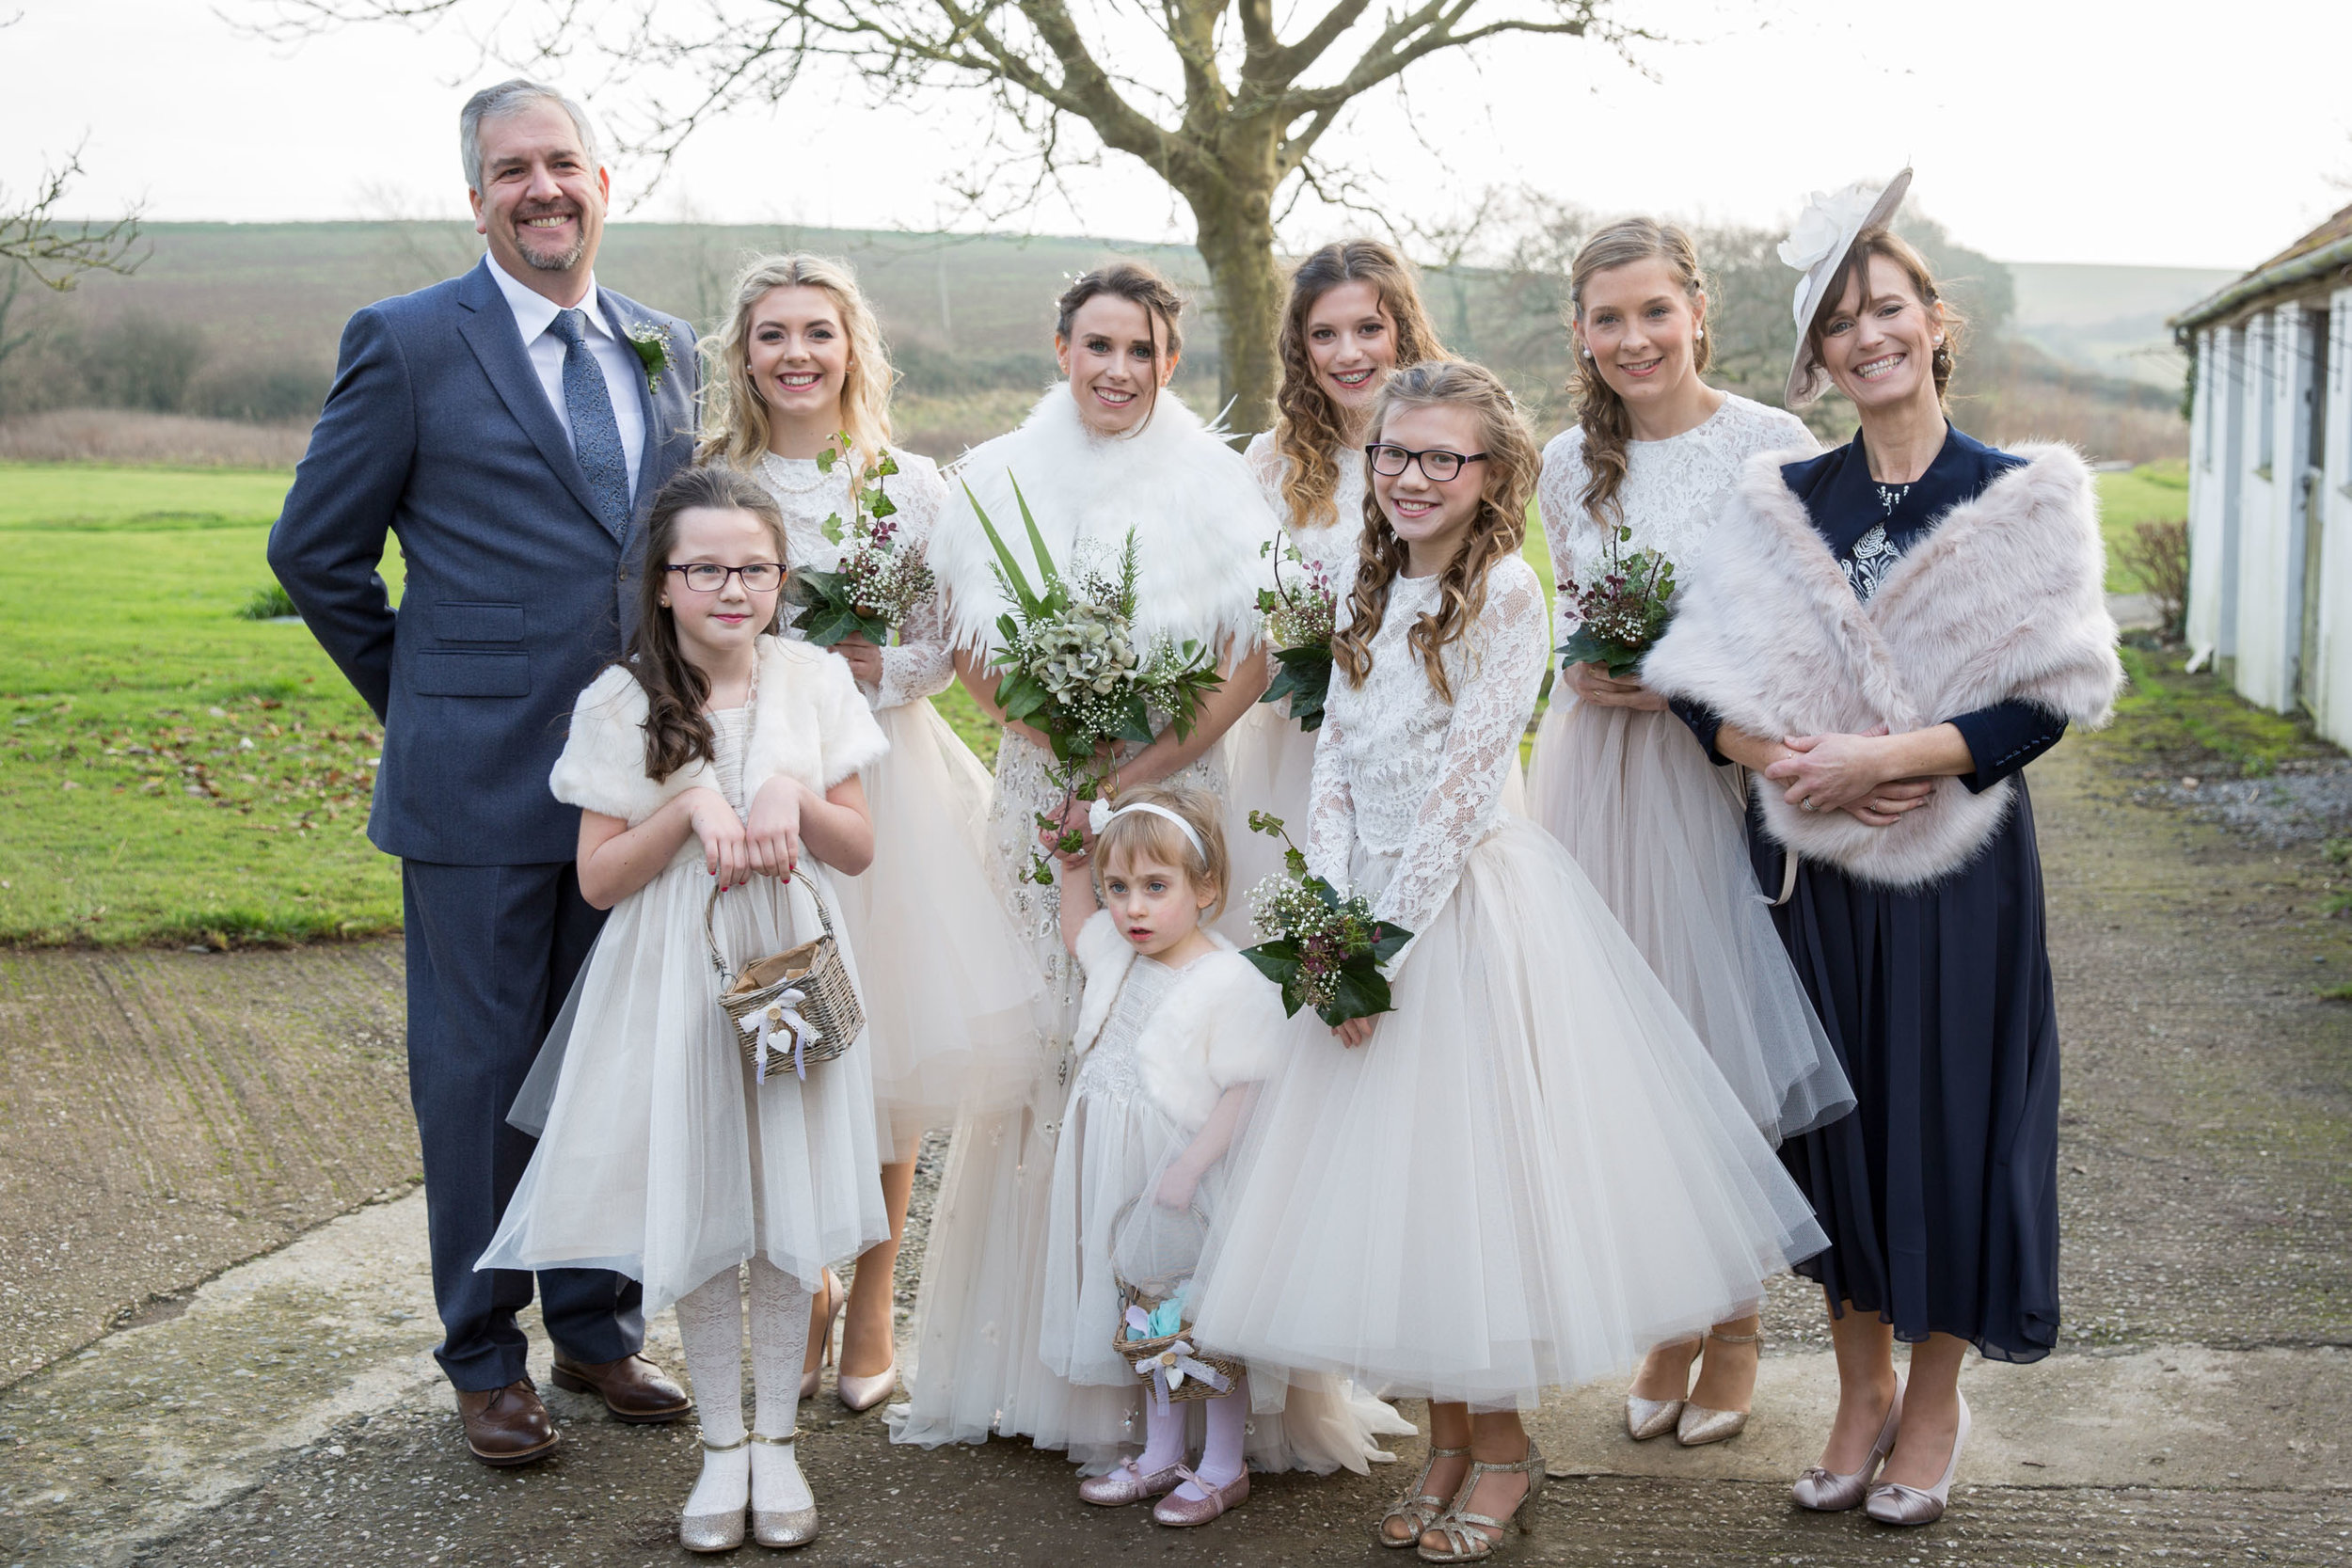 Jess & Ben - Bristol Wedding Photographer - Wright Wedding Photography - 60